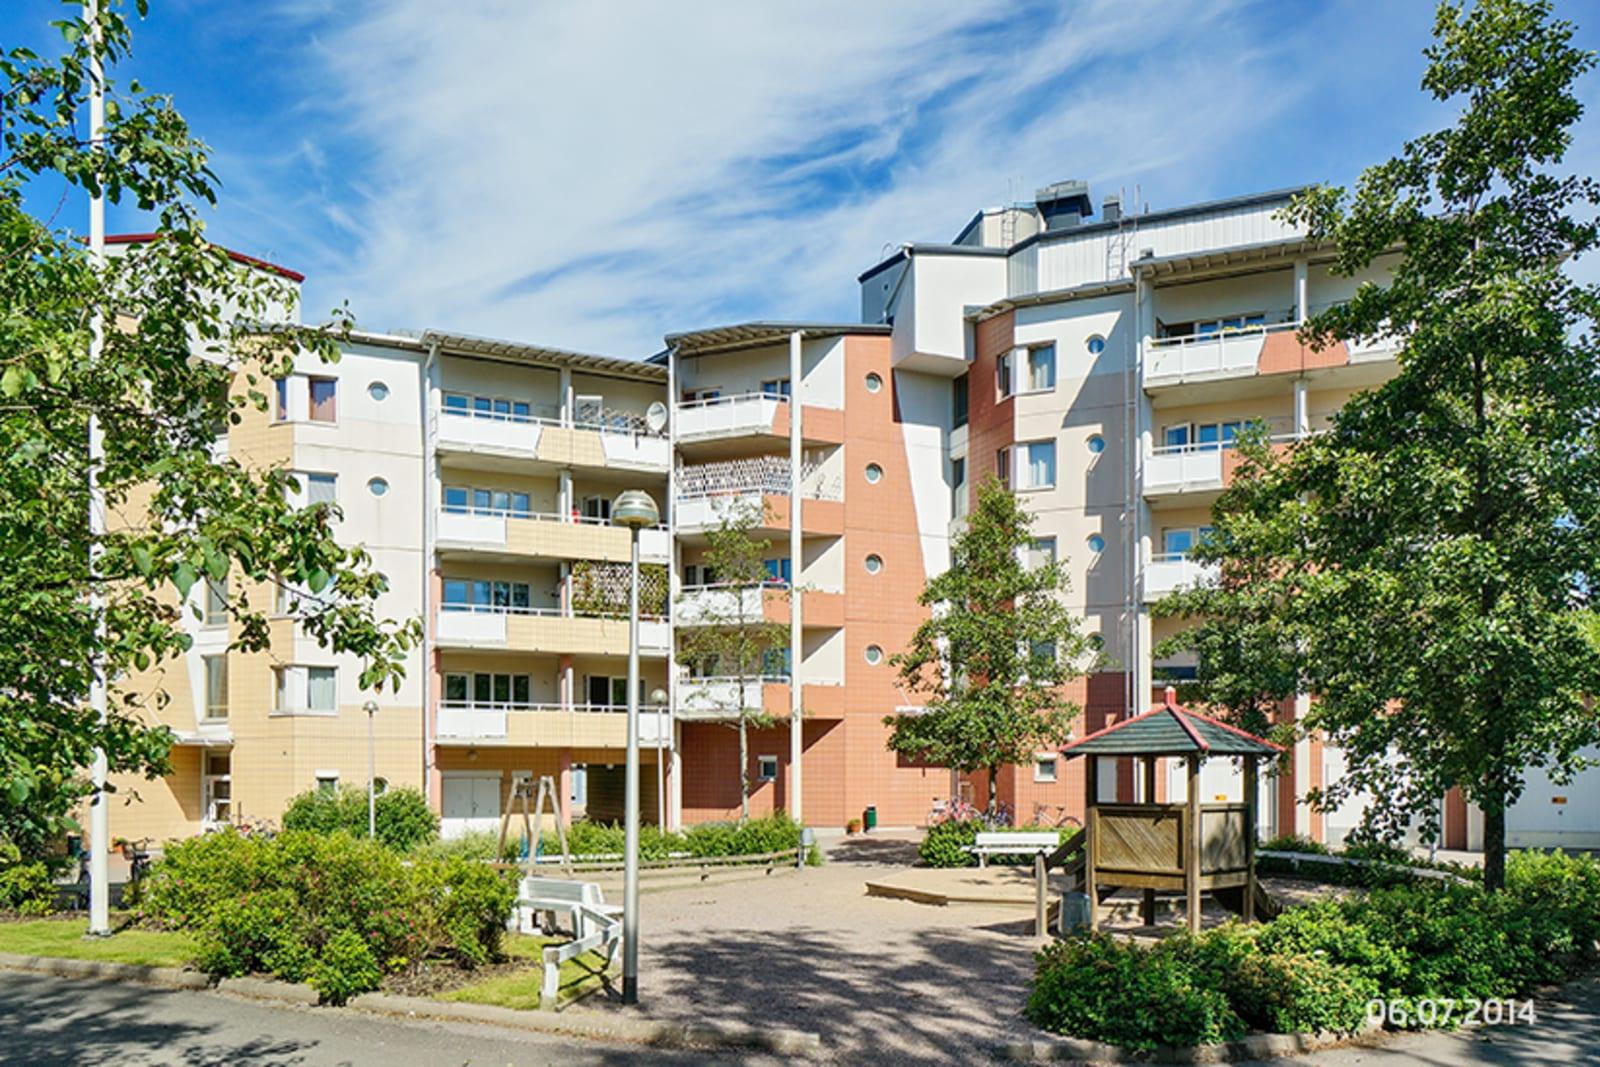 Helsinki, Pikku Huopalahti, Tilkankatu 2